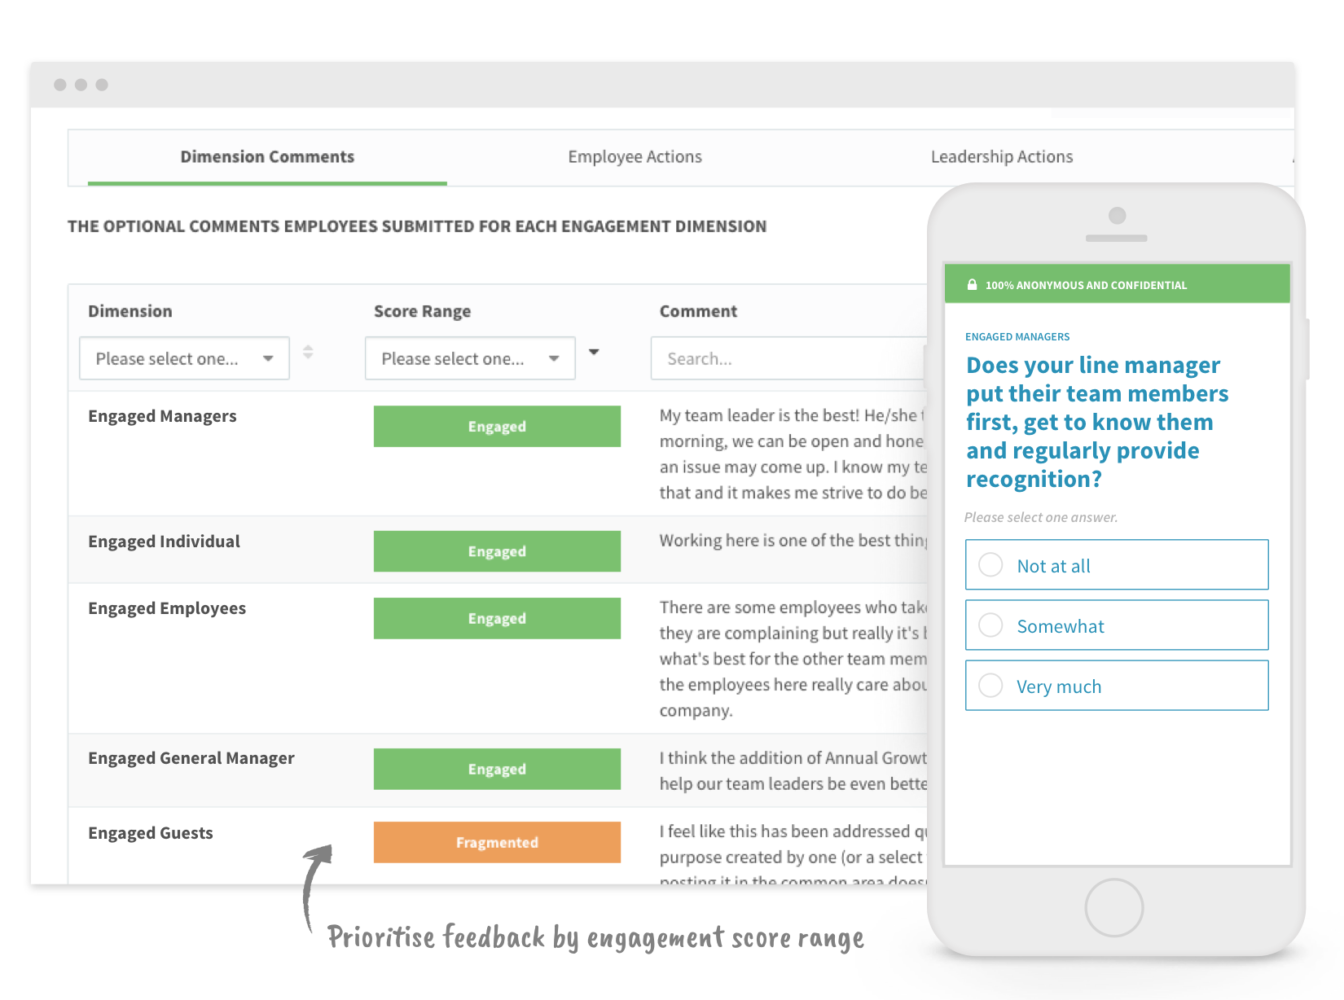 Feedback by engagement score range